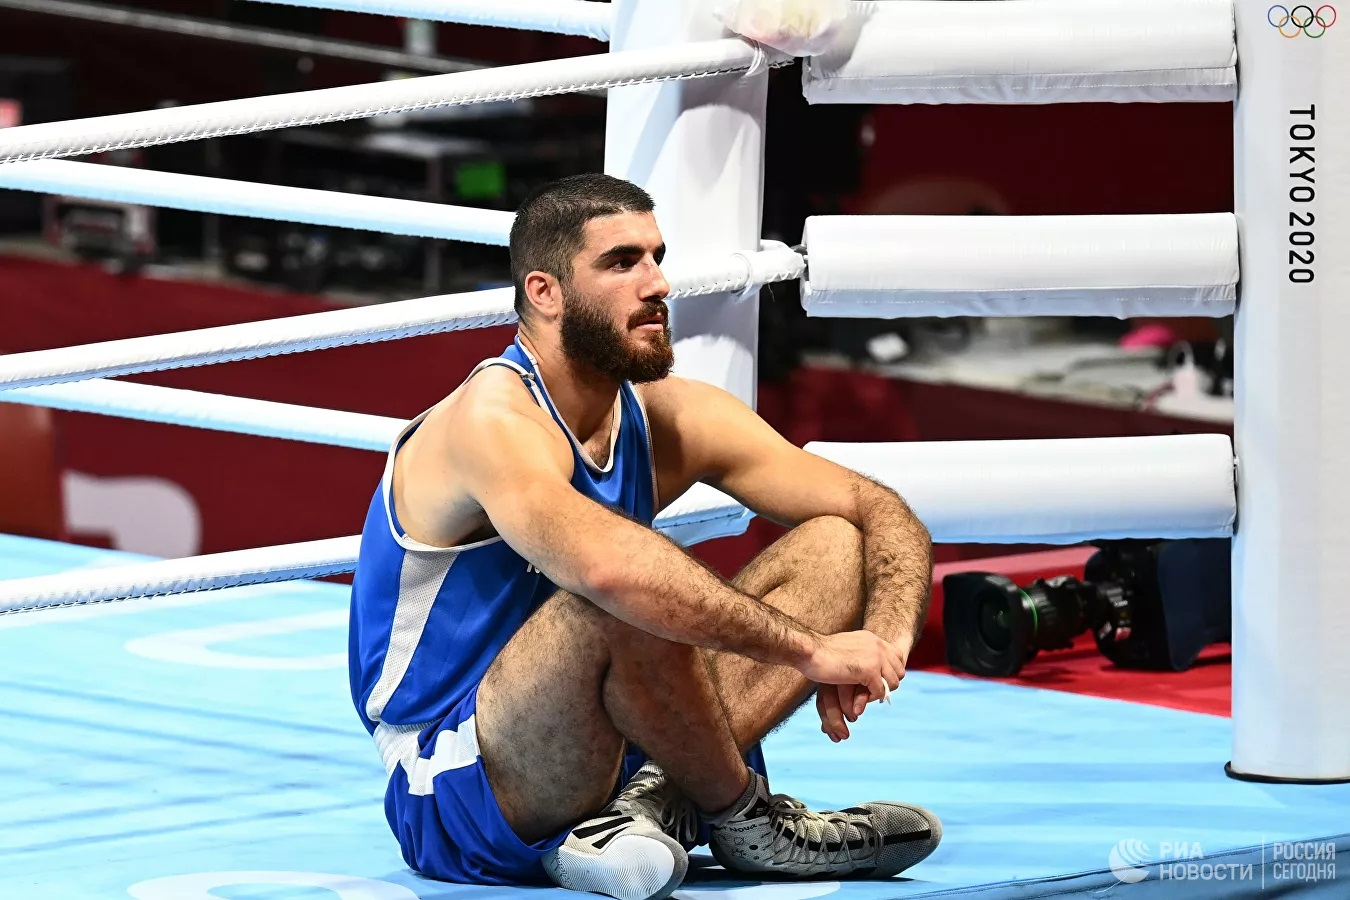 Олимпиада-2020: Французский боксер в знак протеста час не покидал ринг